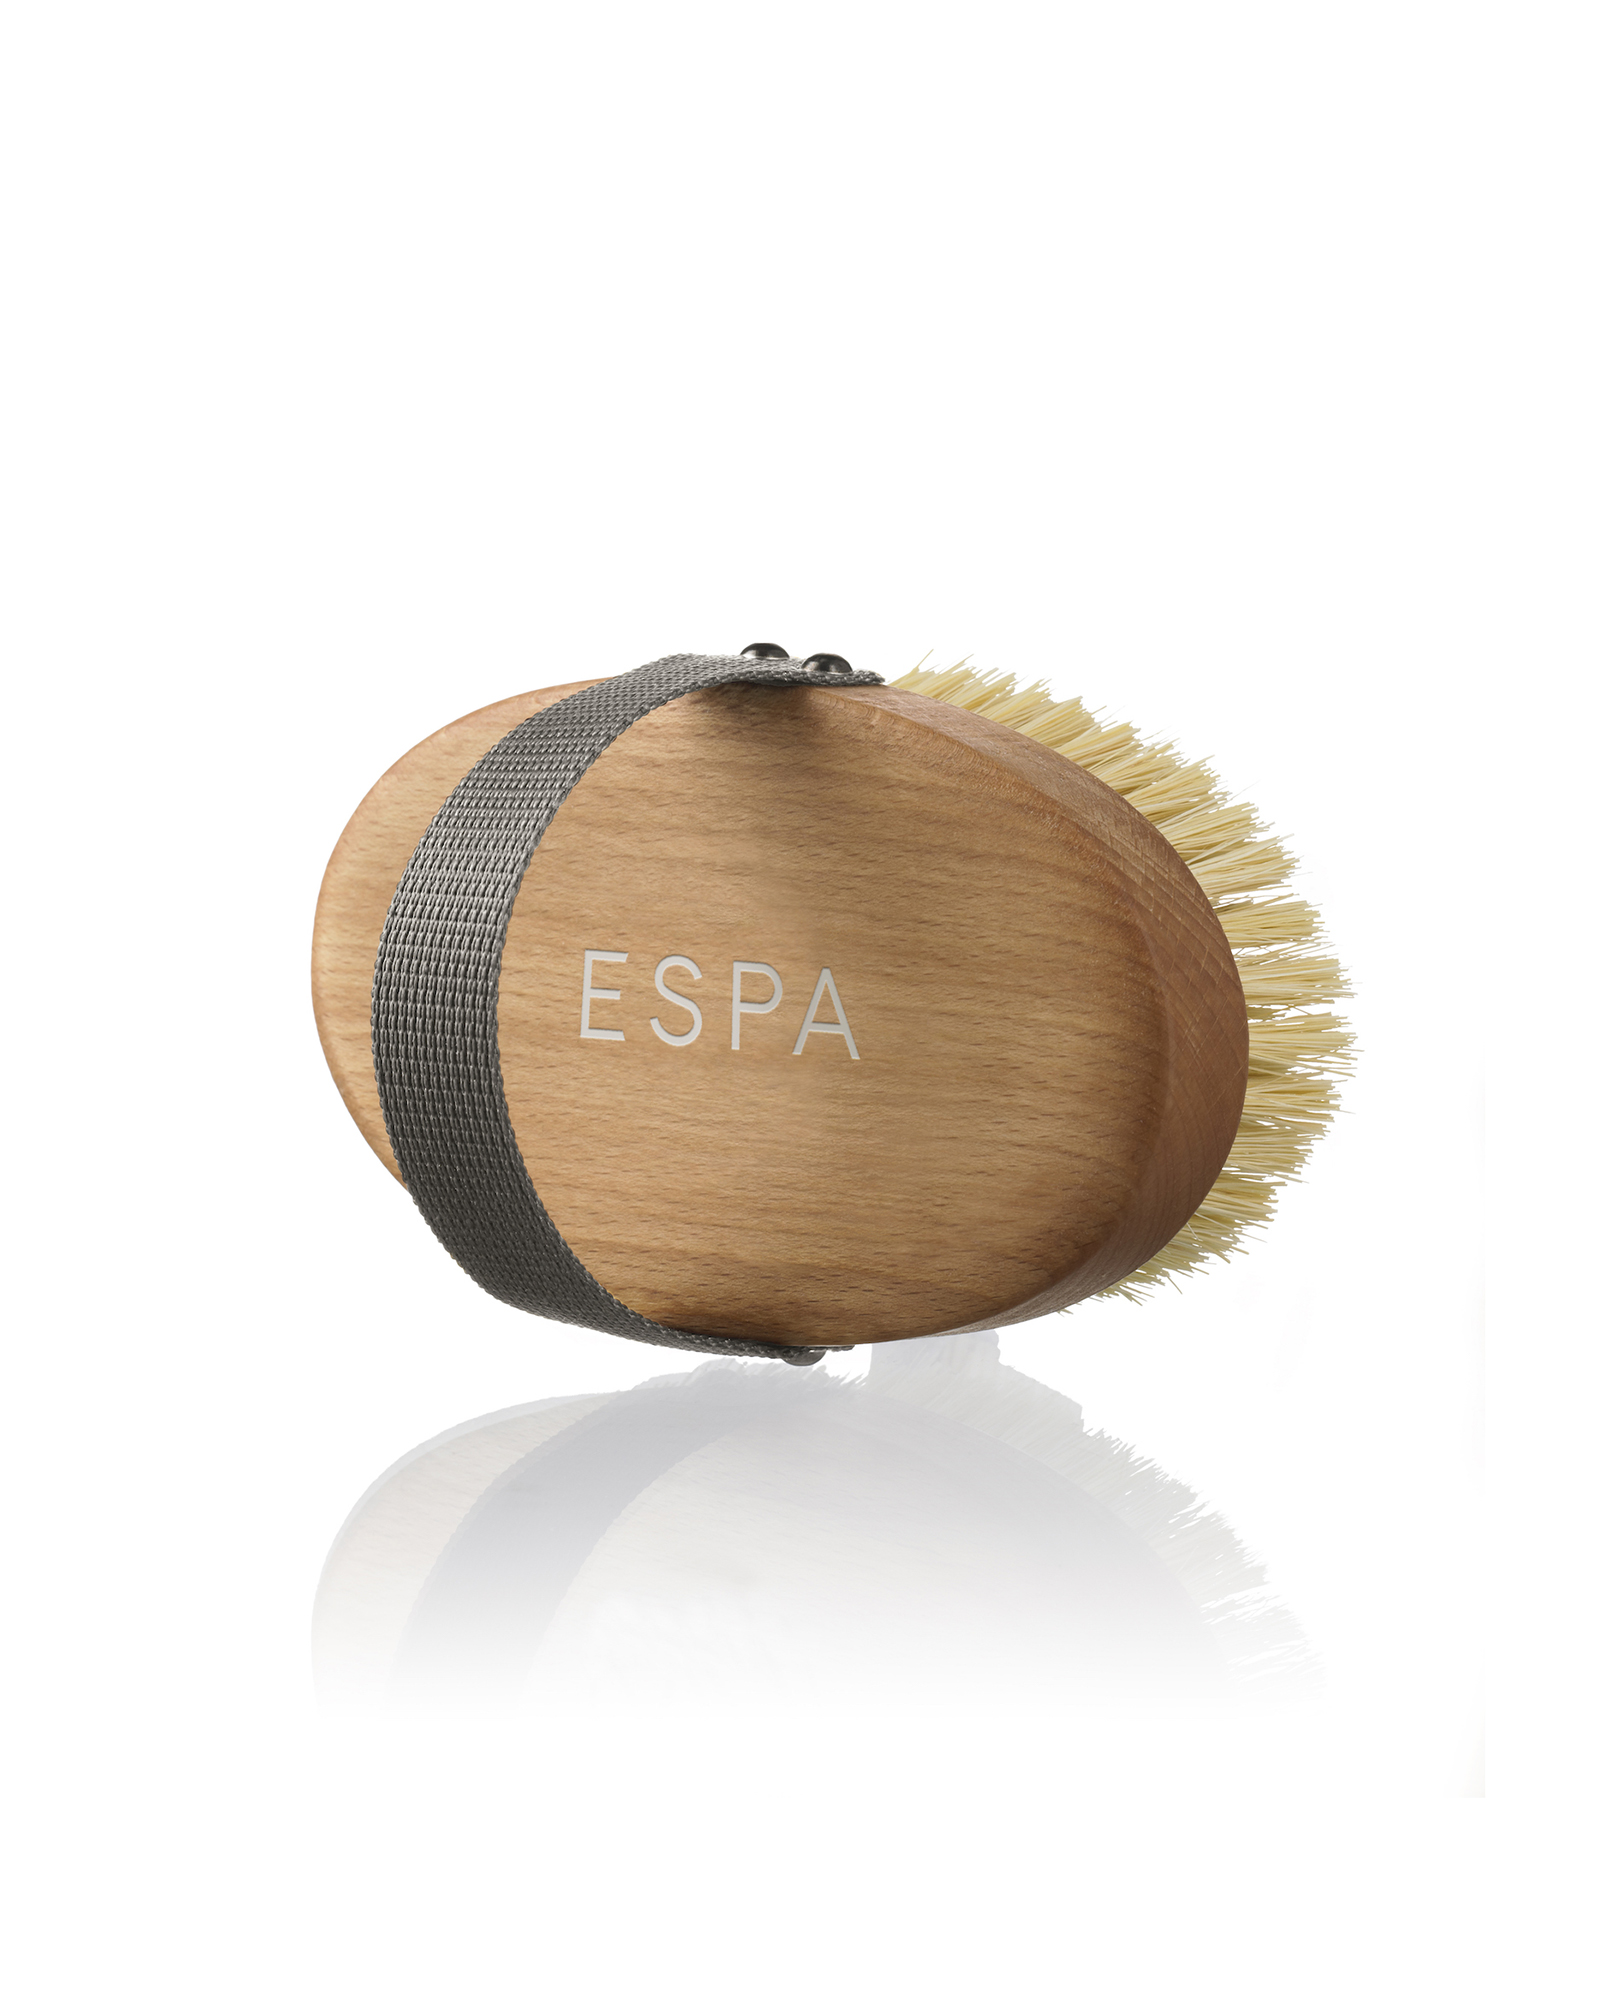 ESPA Skin Stimulating Body Brush